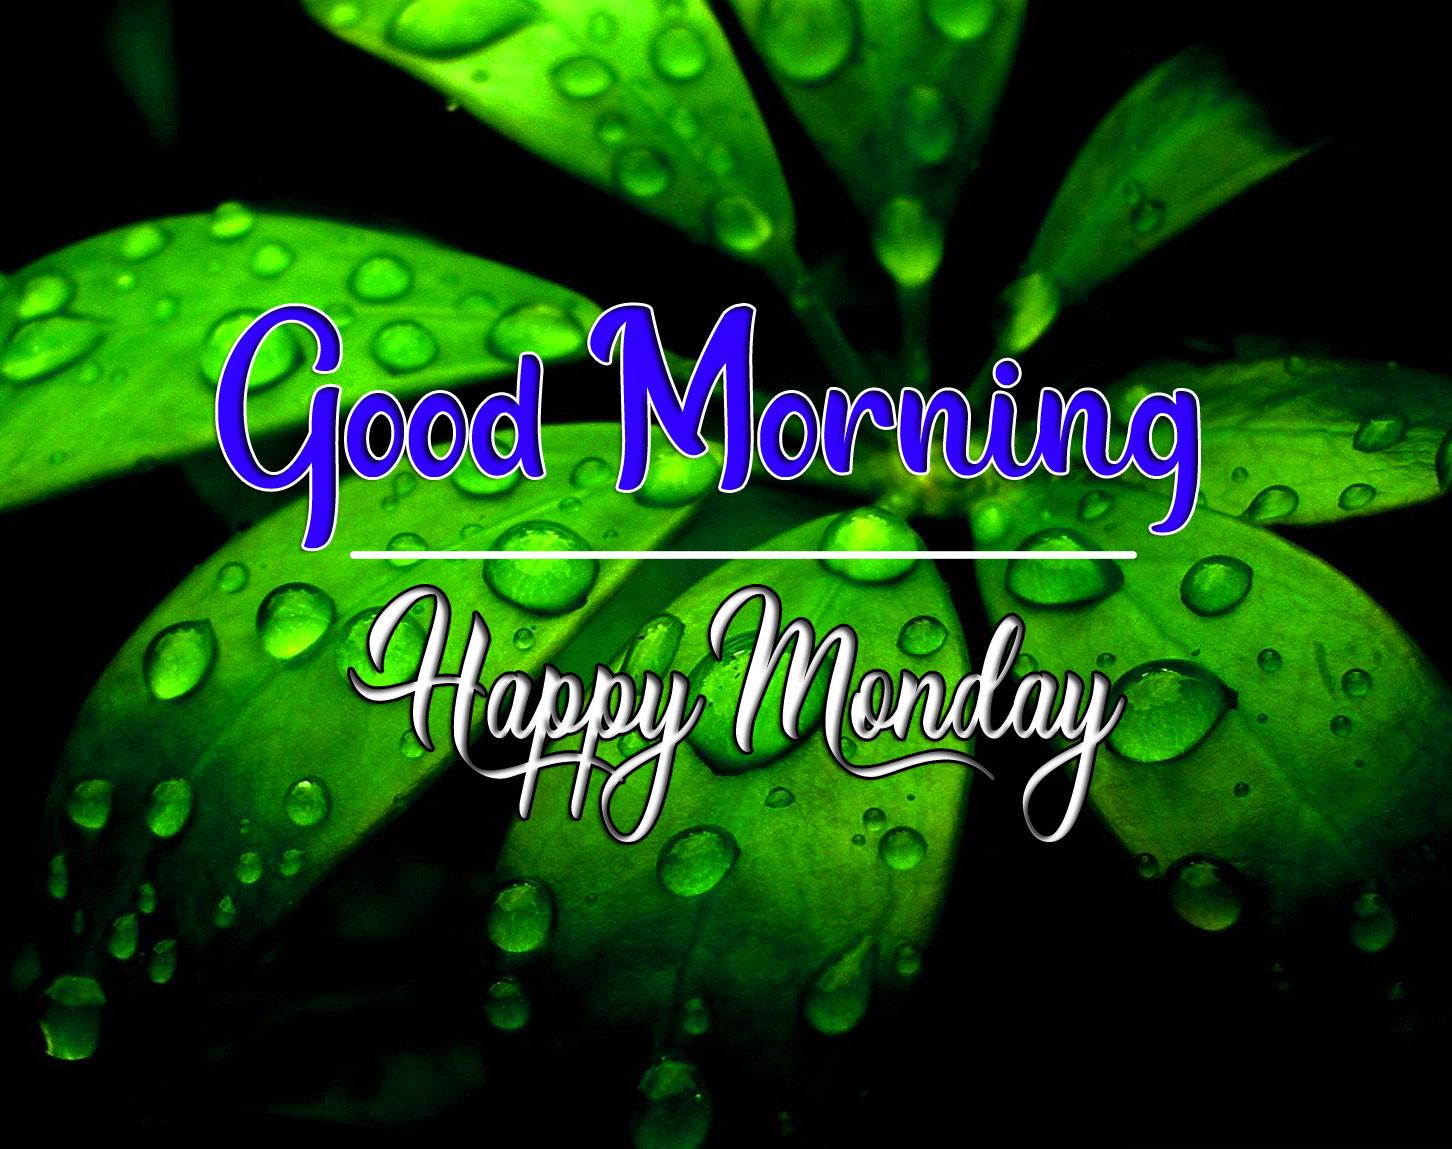 Monday Good Morning Pics HD New 1